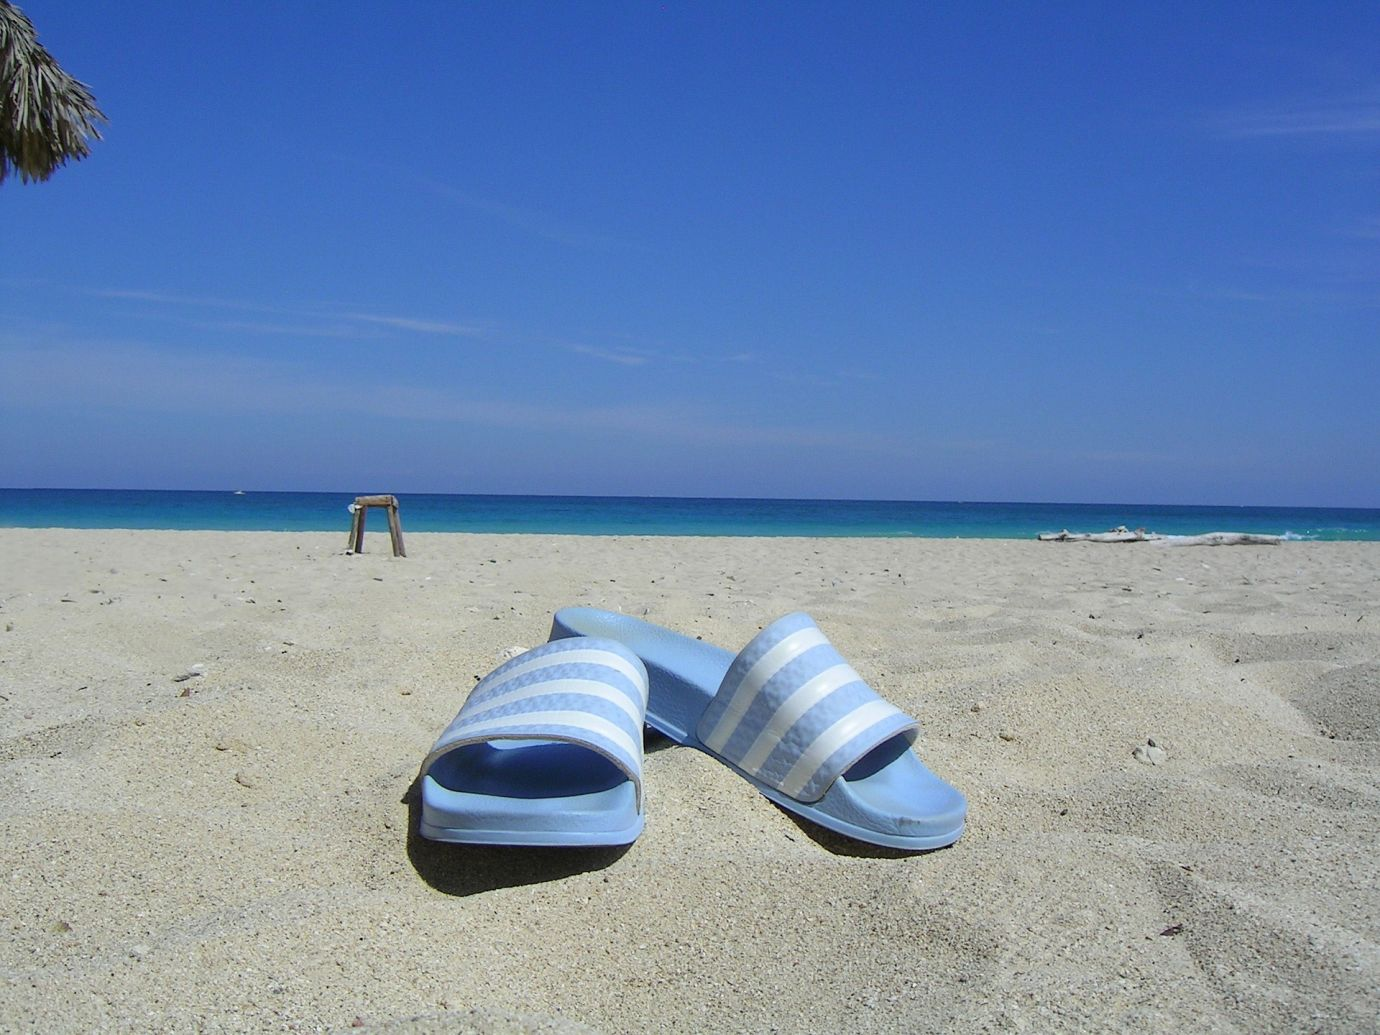 Adiletten am Strand